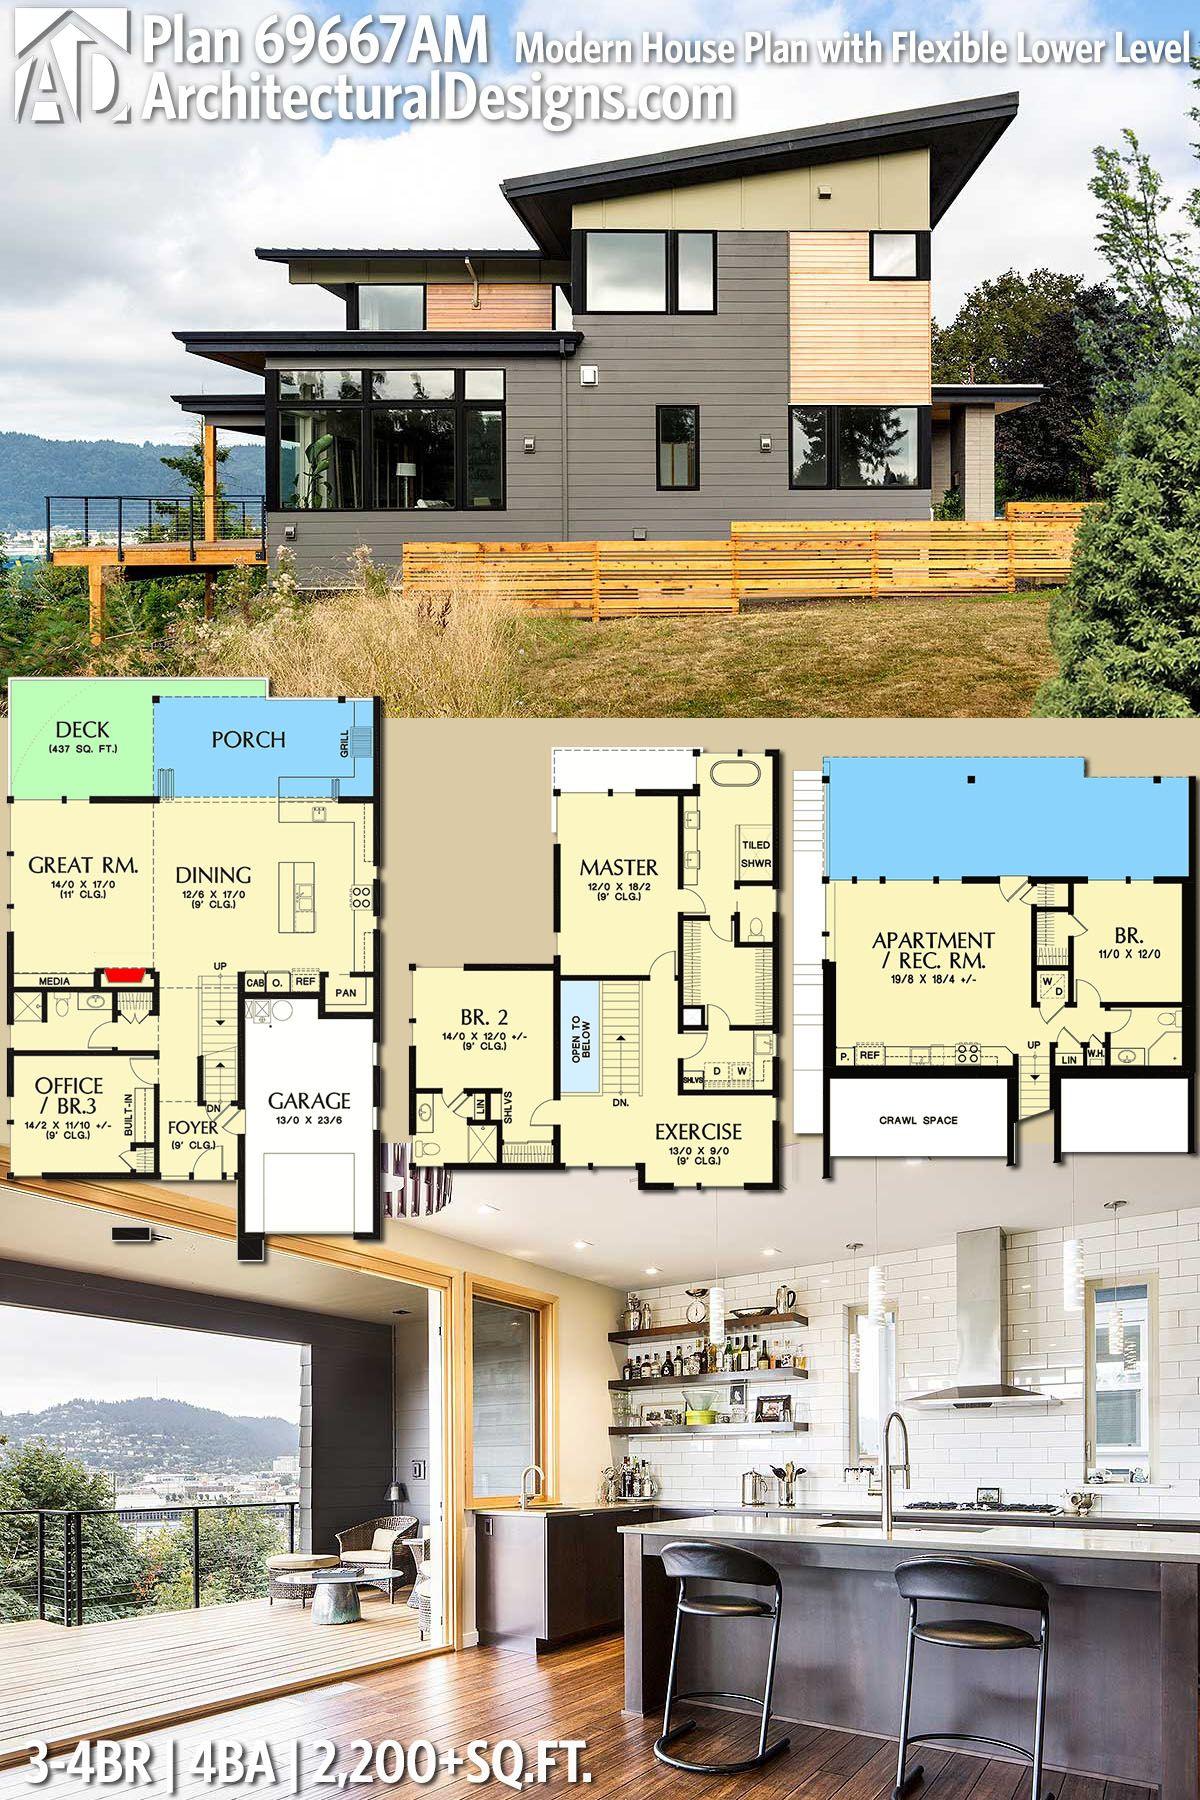 Plan 69667AM Modern House Plan with Flexible